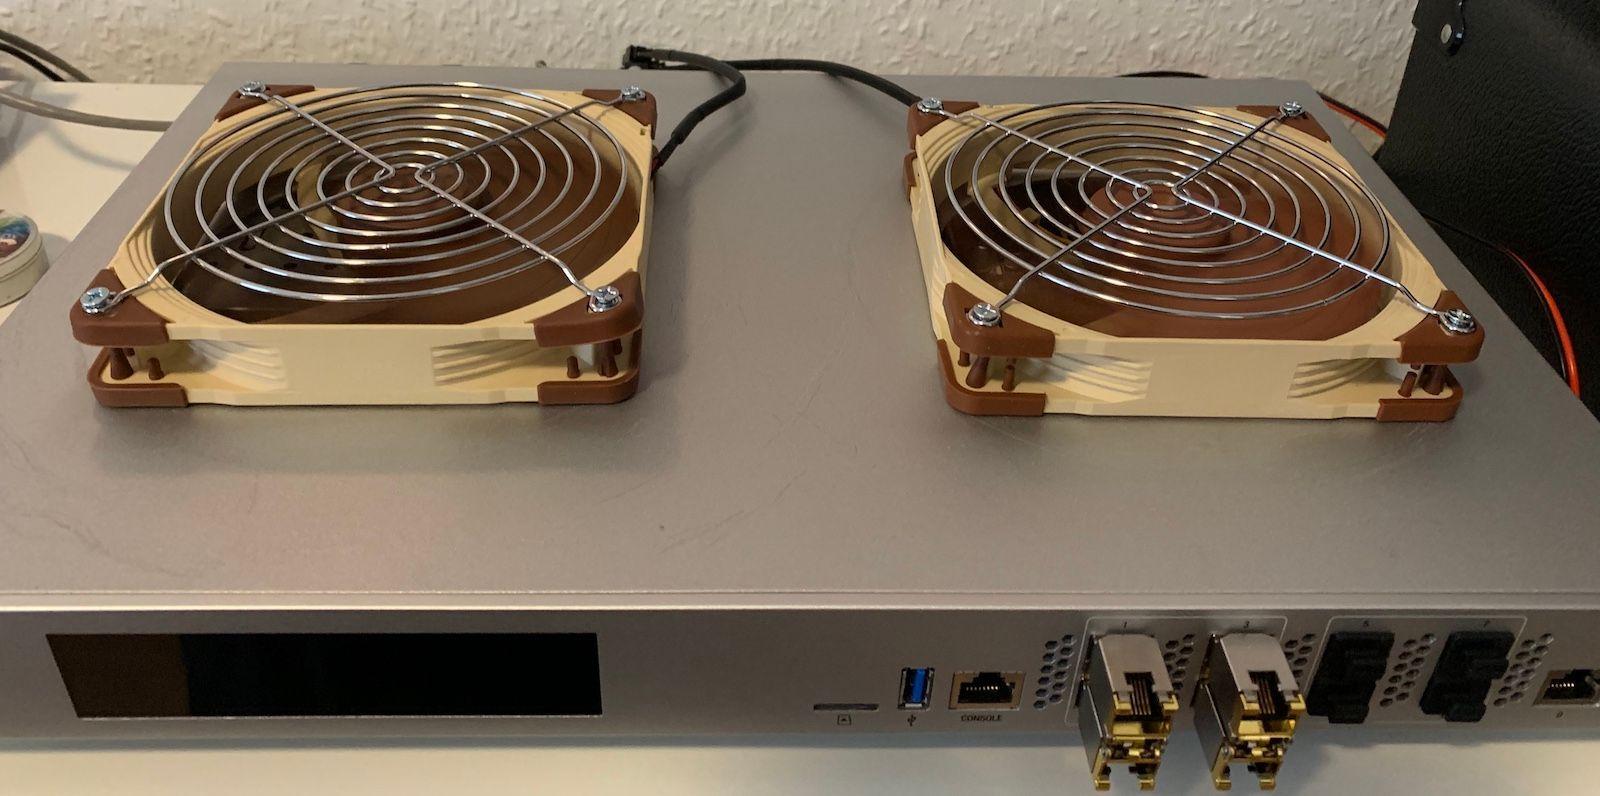 USG-XG-8 noise/cooling: fan swap and case modification